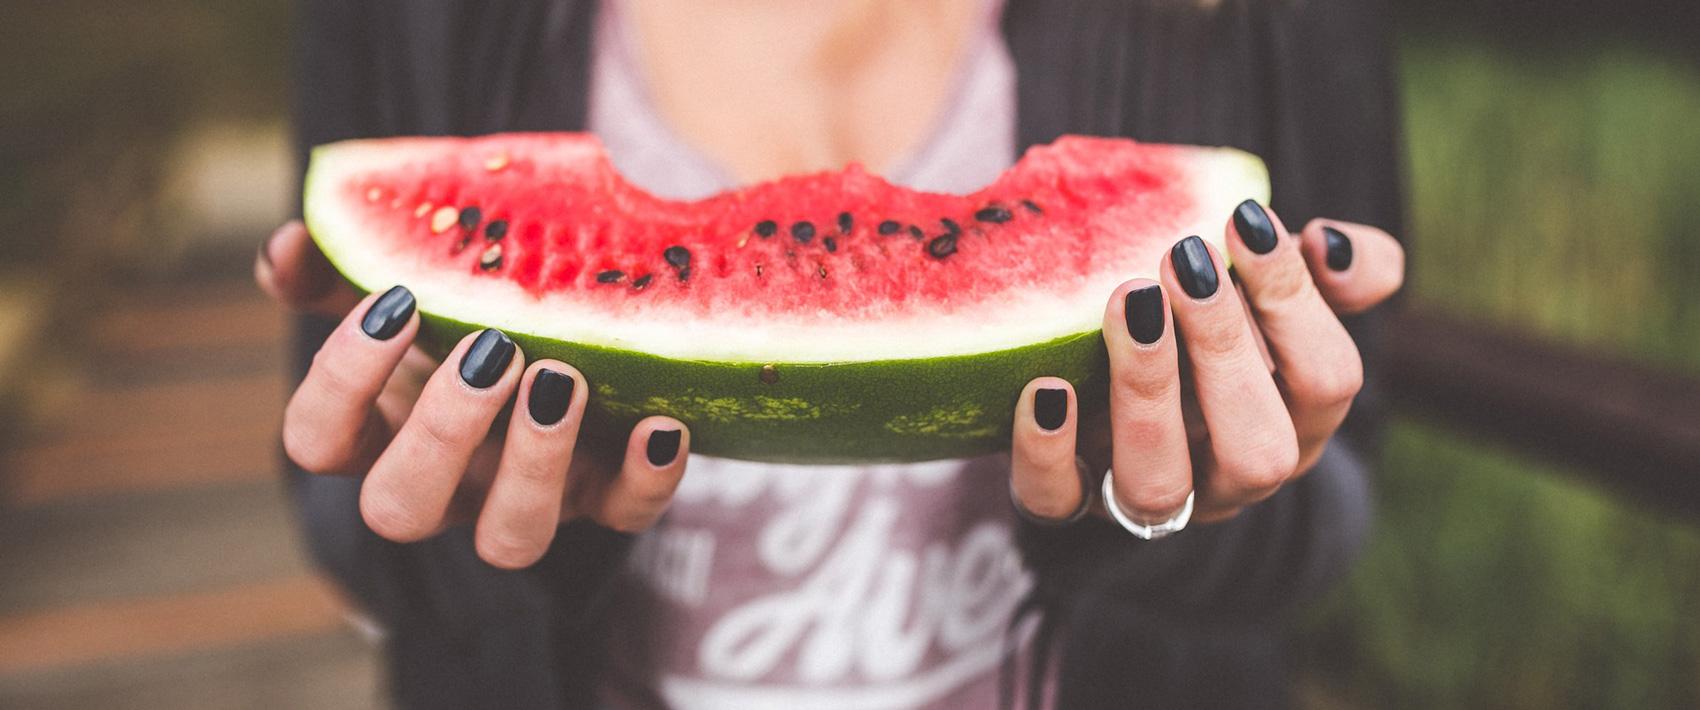 watermelon-869207_1920